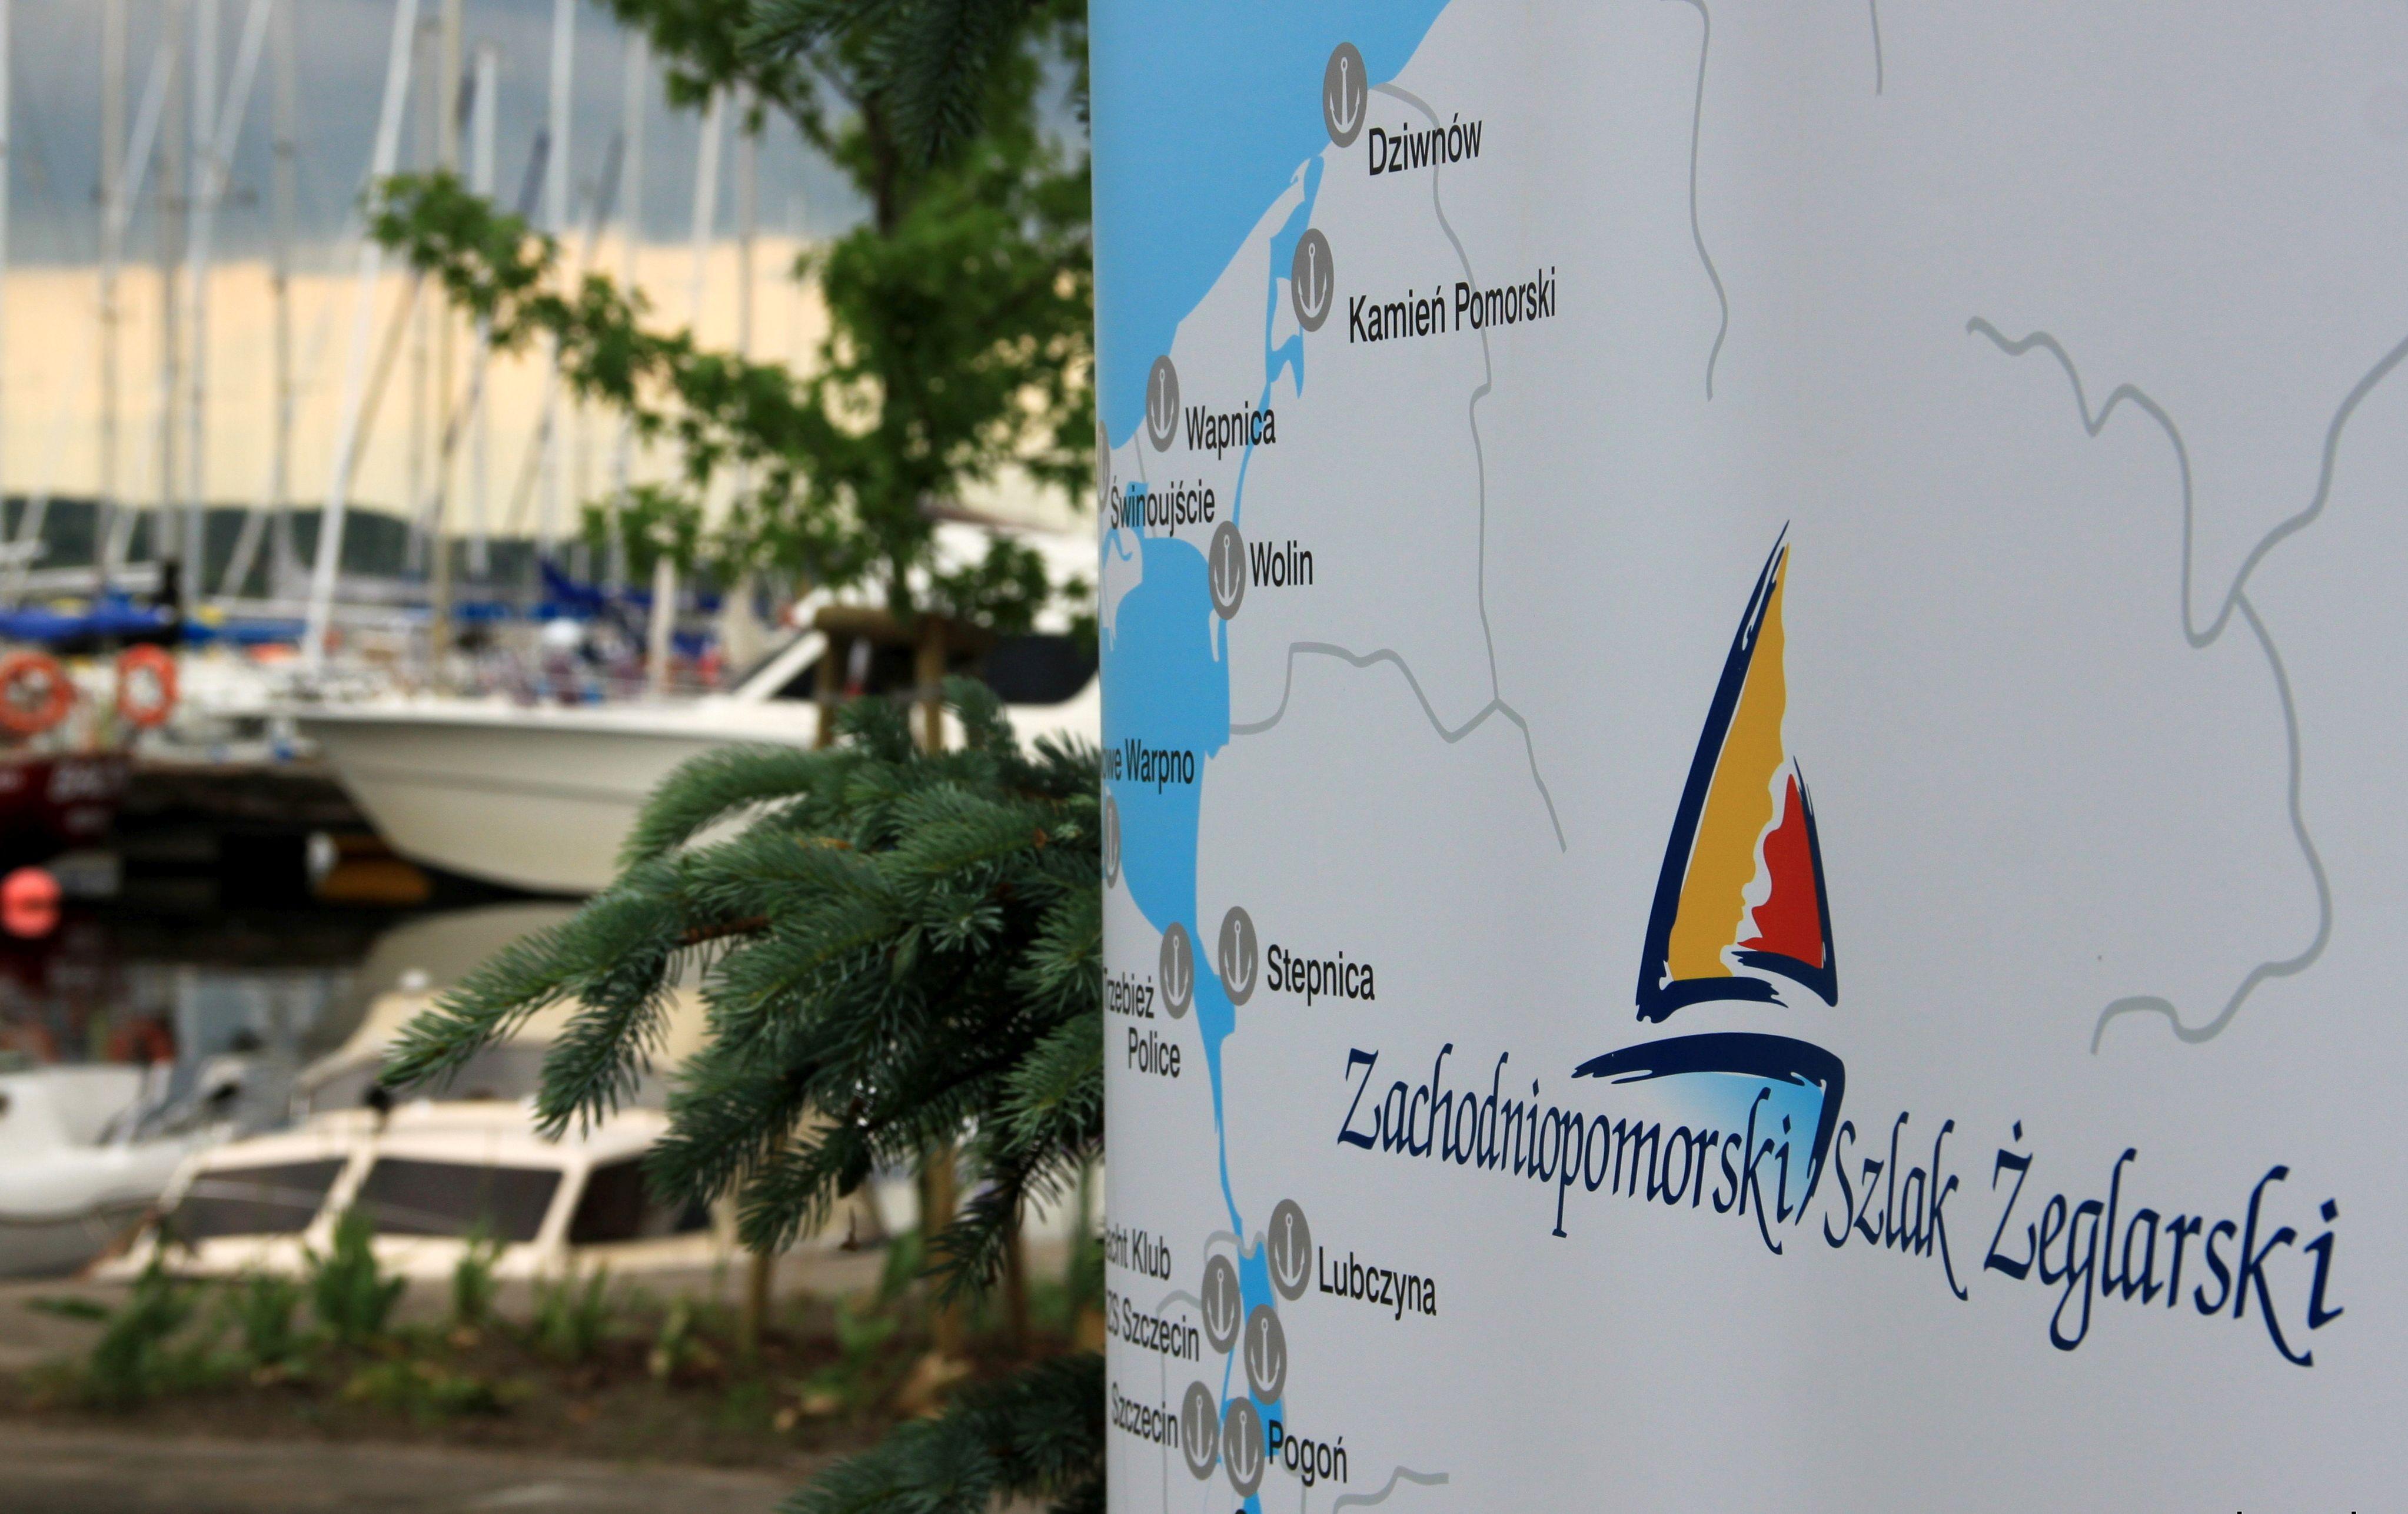 Zachodniopomorski Szlak Żeglarski